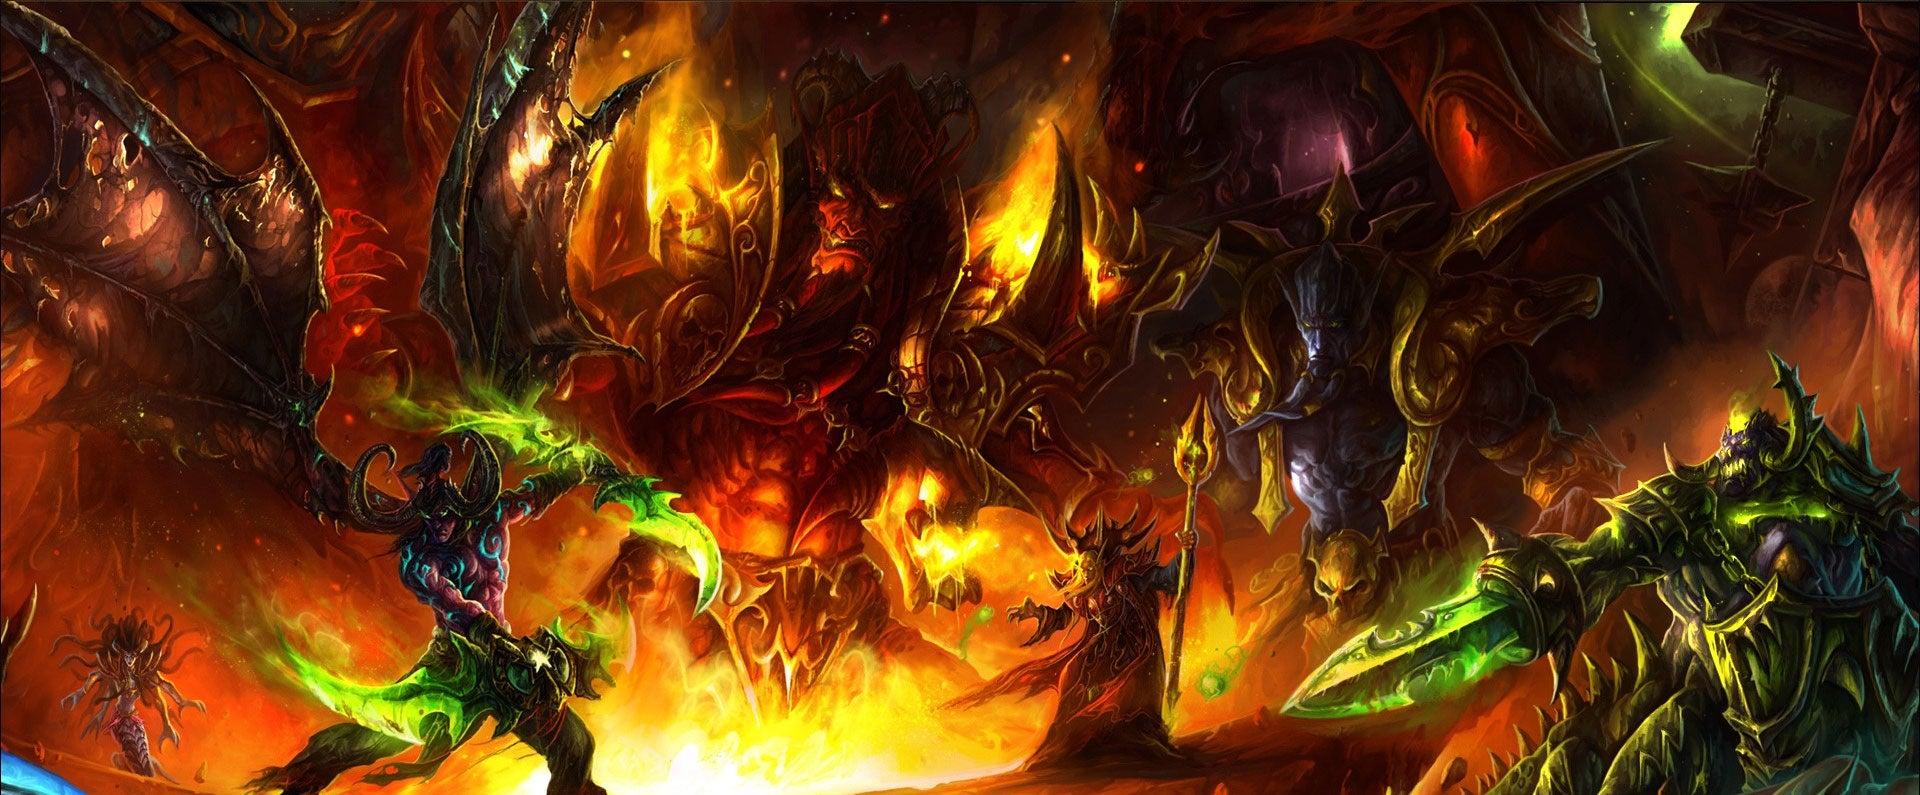 The Crushing Design Of World Of Warcraft's Big Raids